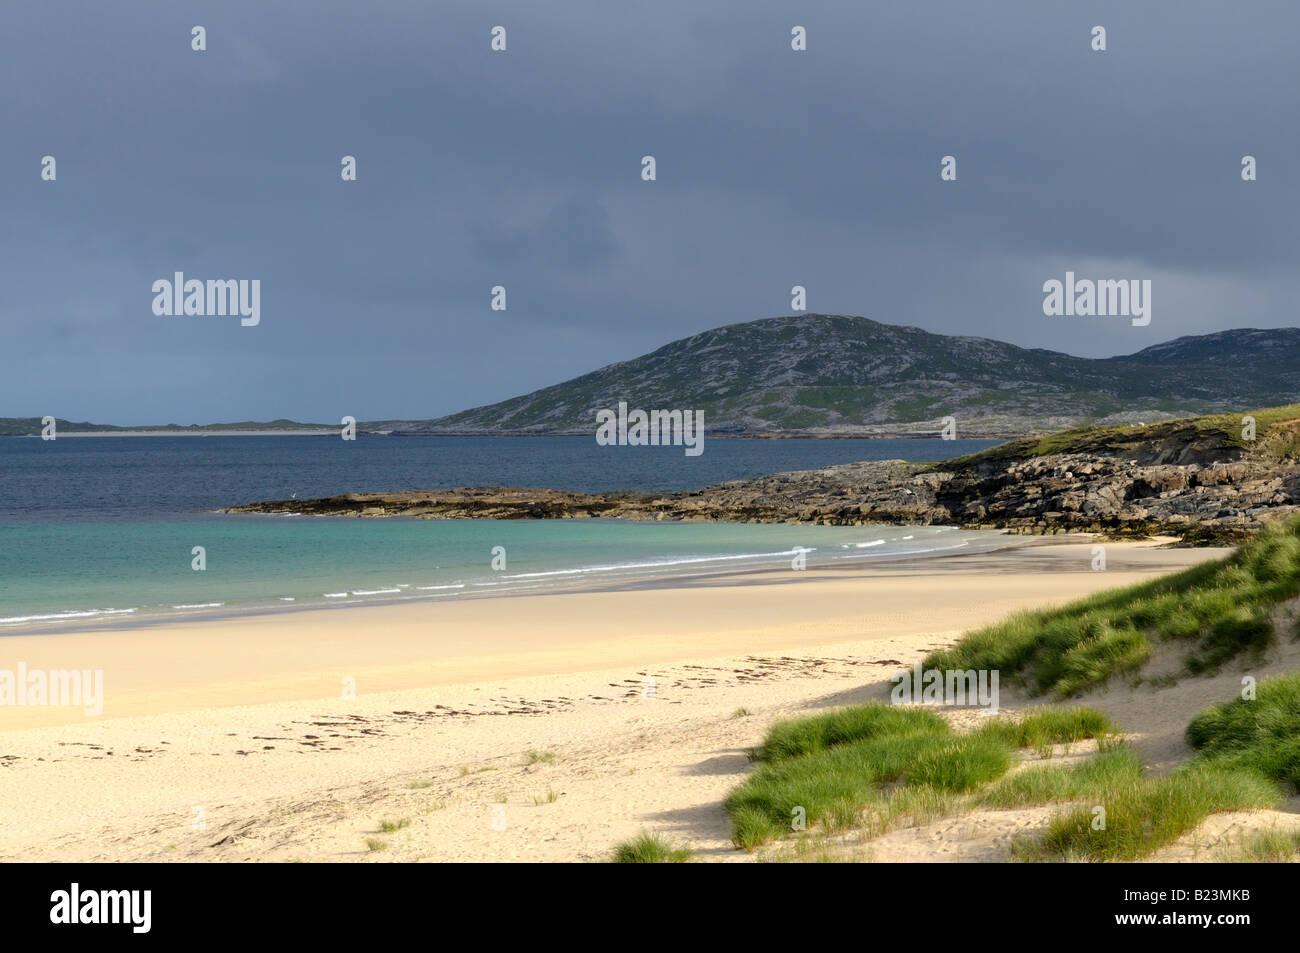 View over Traigh Lar beach to the island of Taransay - Stock Image